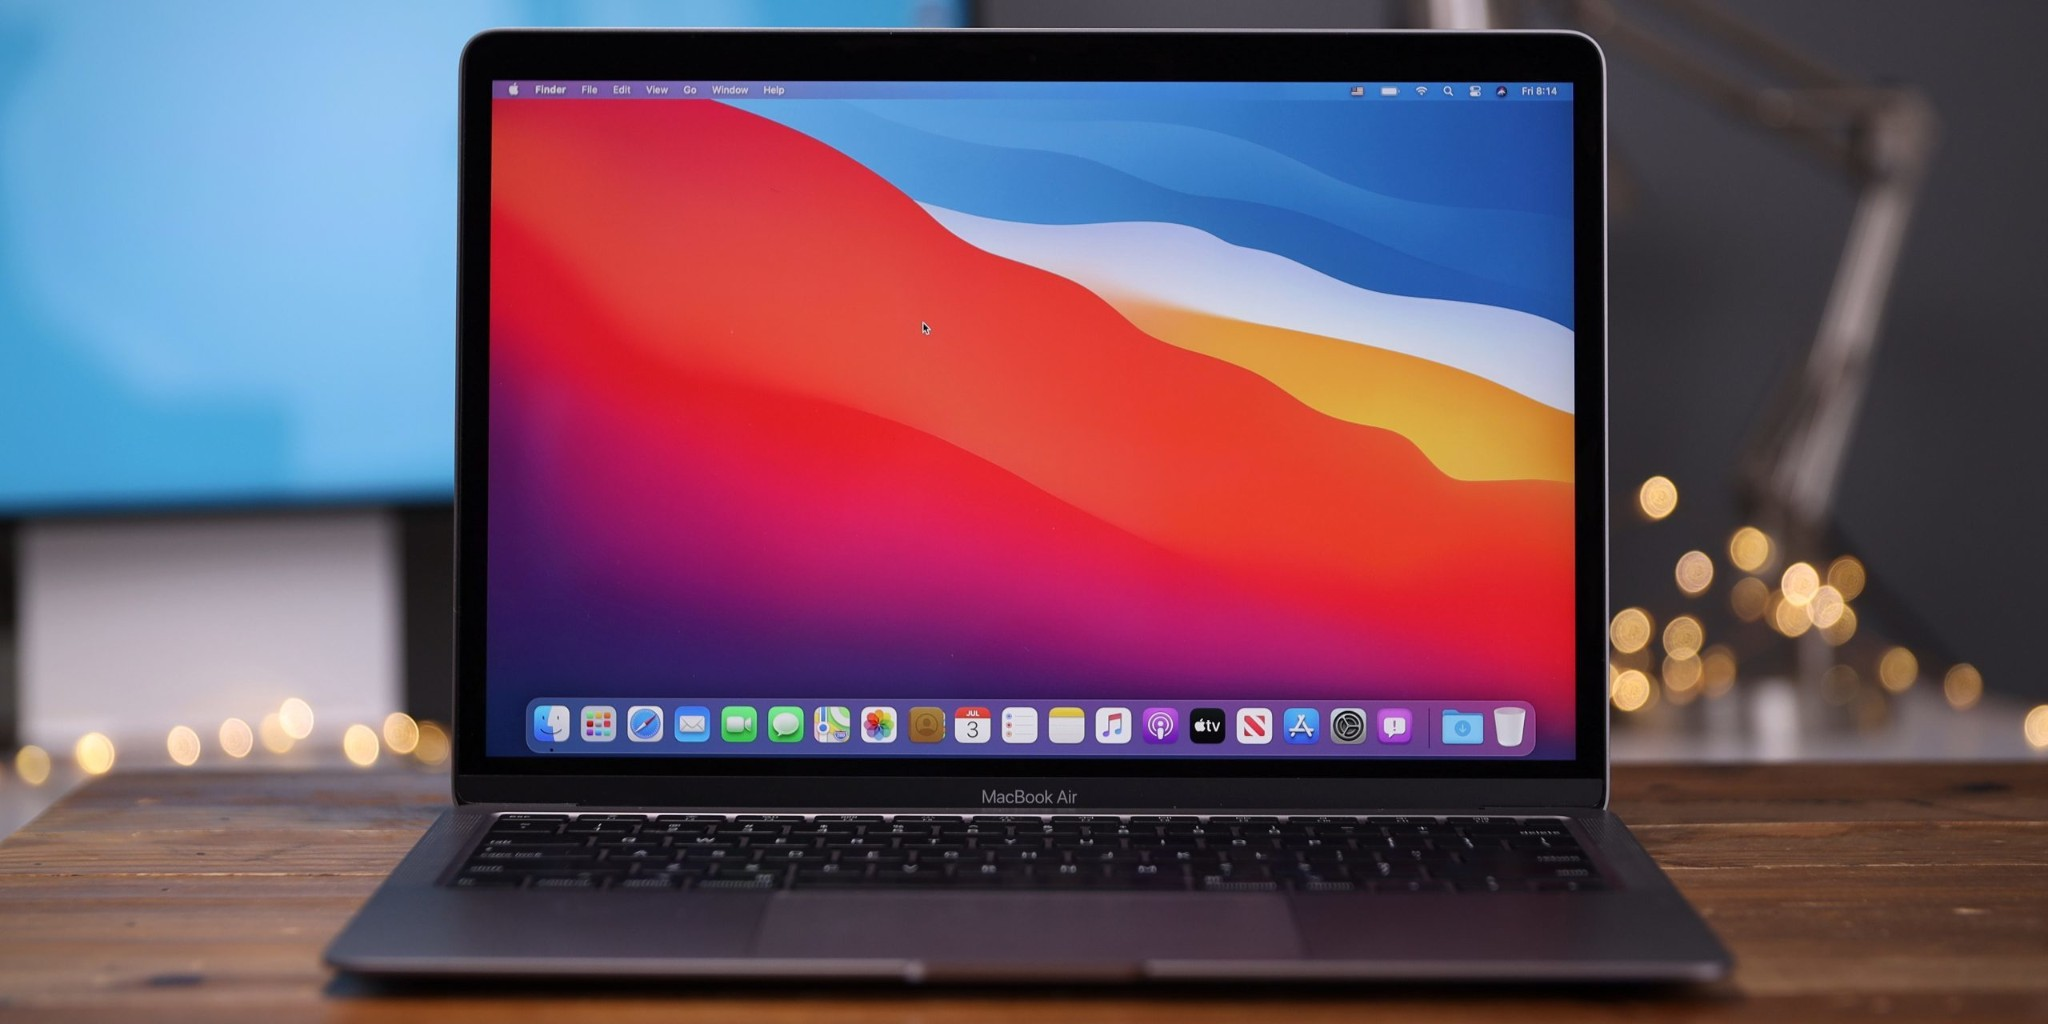 K-12 Schools: When should IT departments install iOS 14? - 9to5Mac